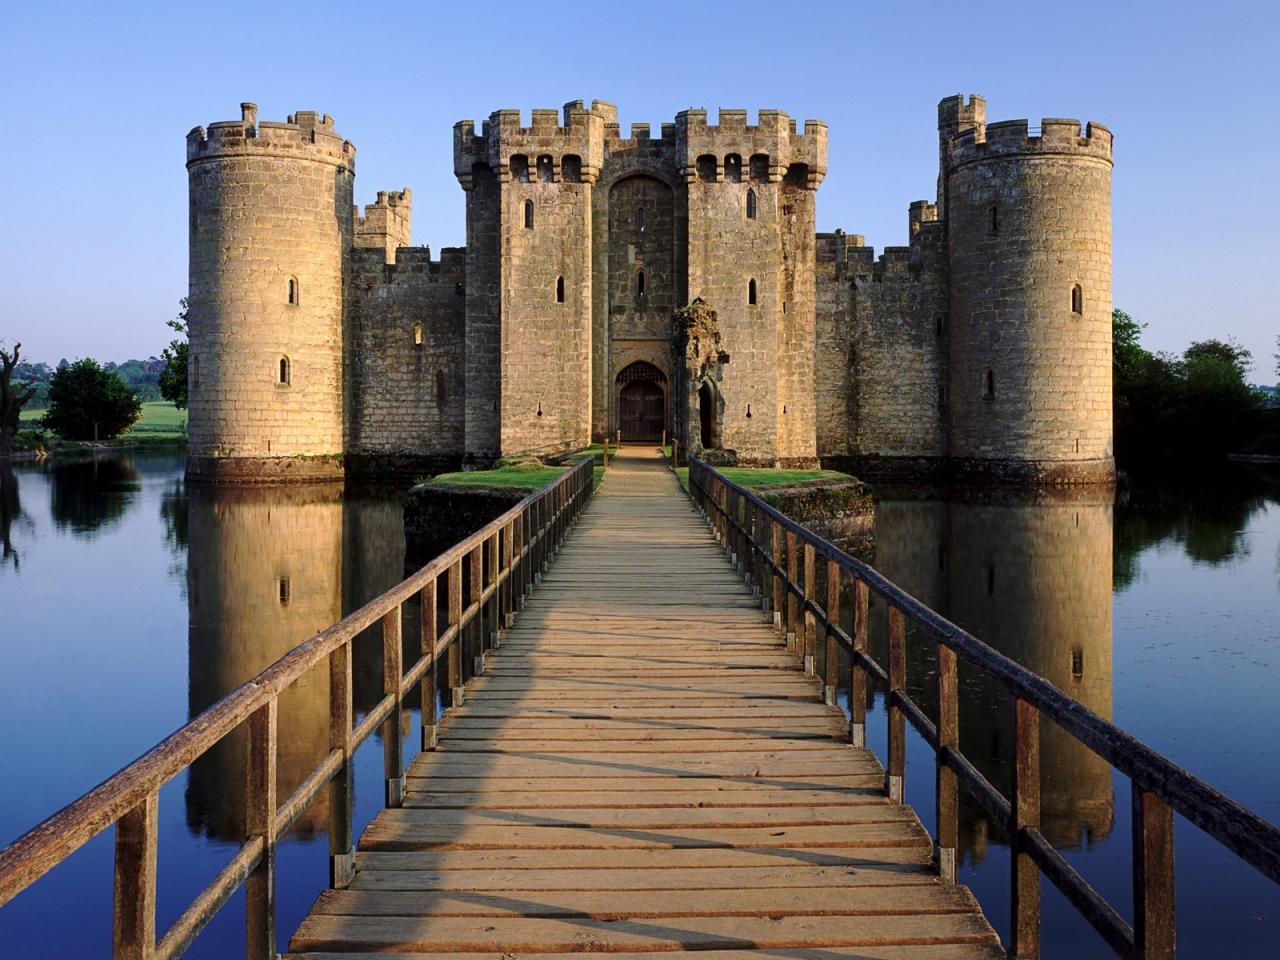 El castillo Bodia en Inglaterra - 1280x960